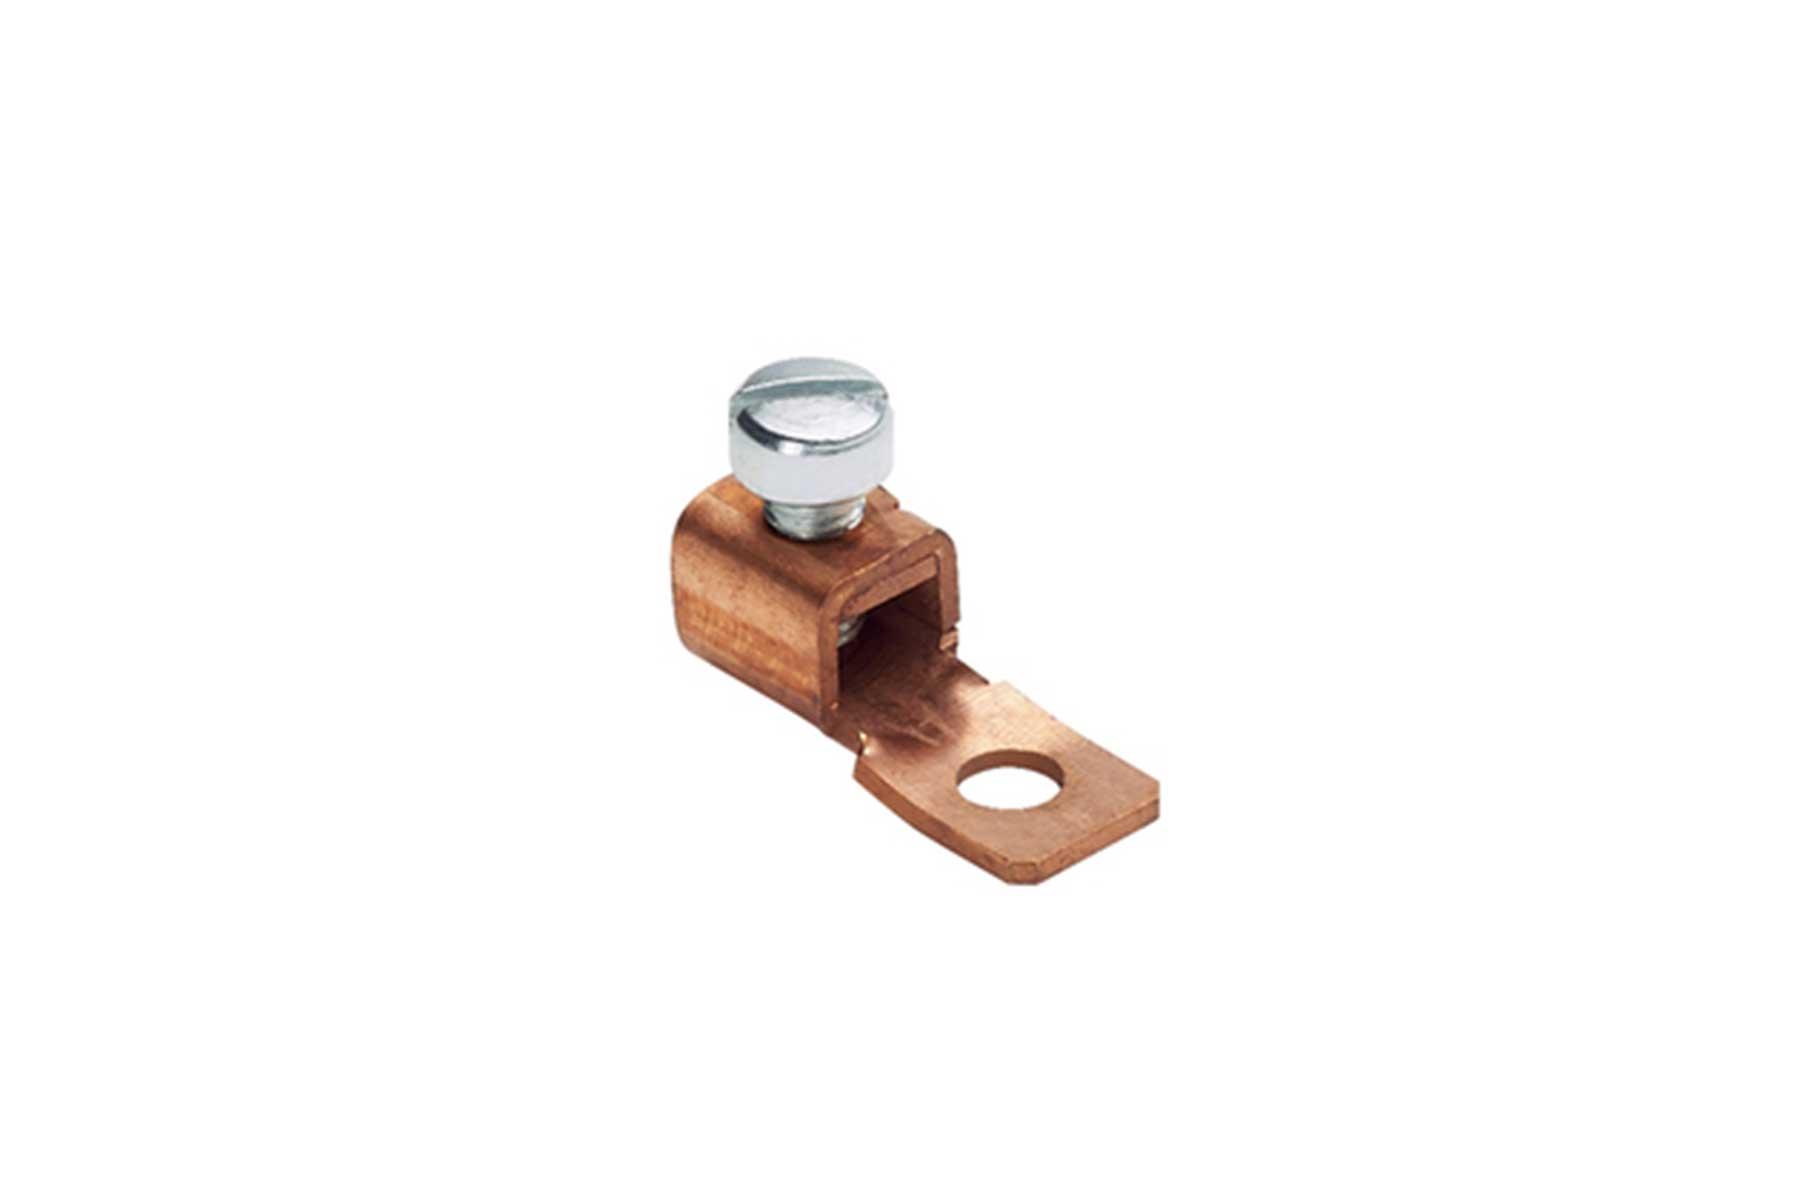 1 Hole Solderless Copper Mechanical Lug - Fixed Tongue